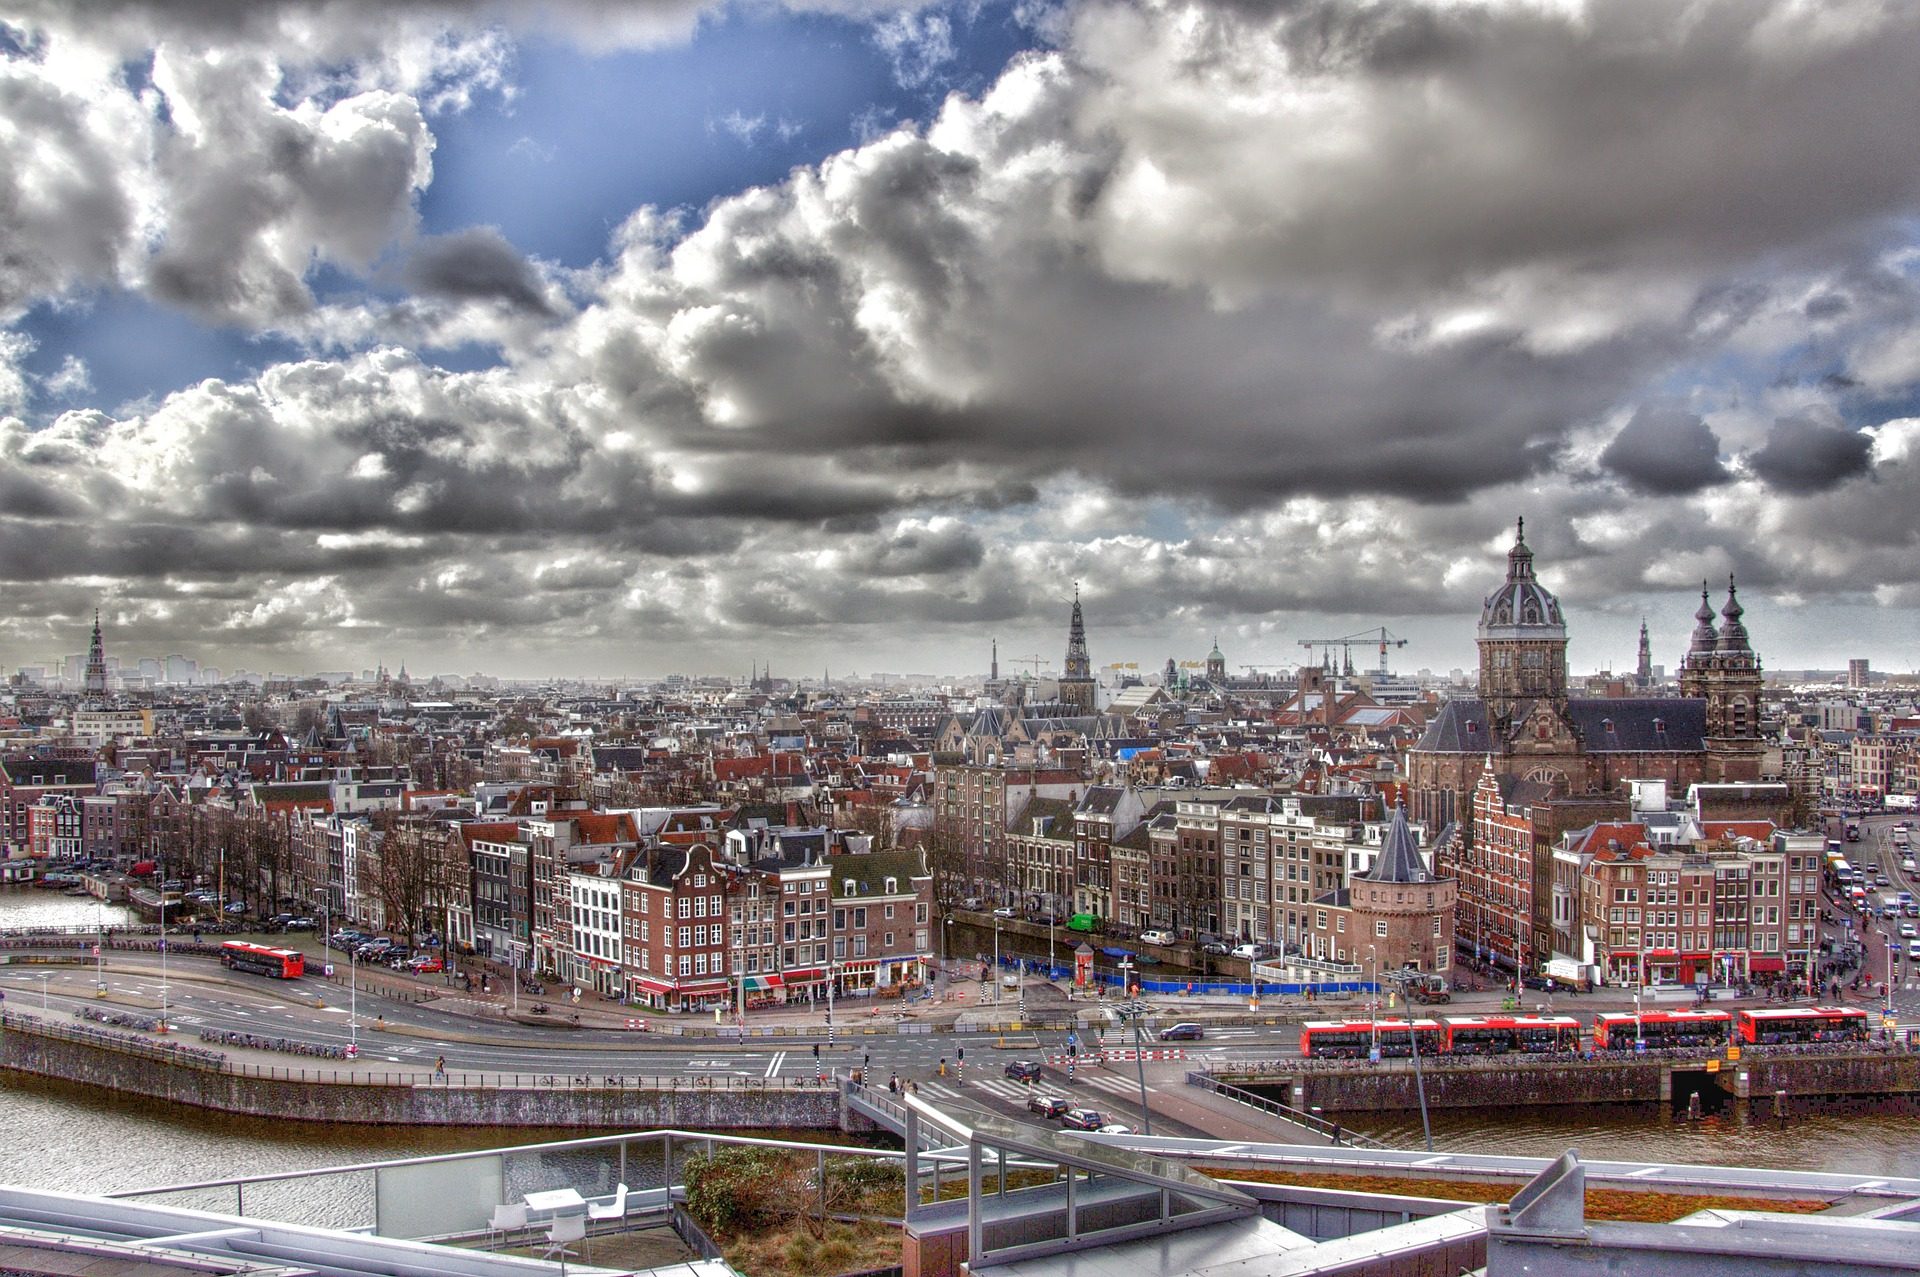 amsterdam-683518_1920.jpg